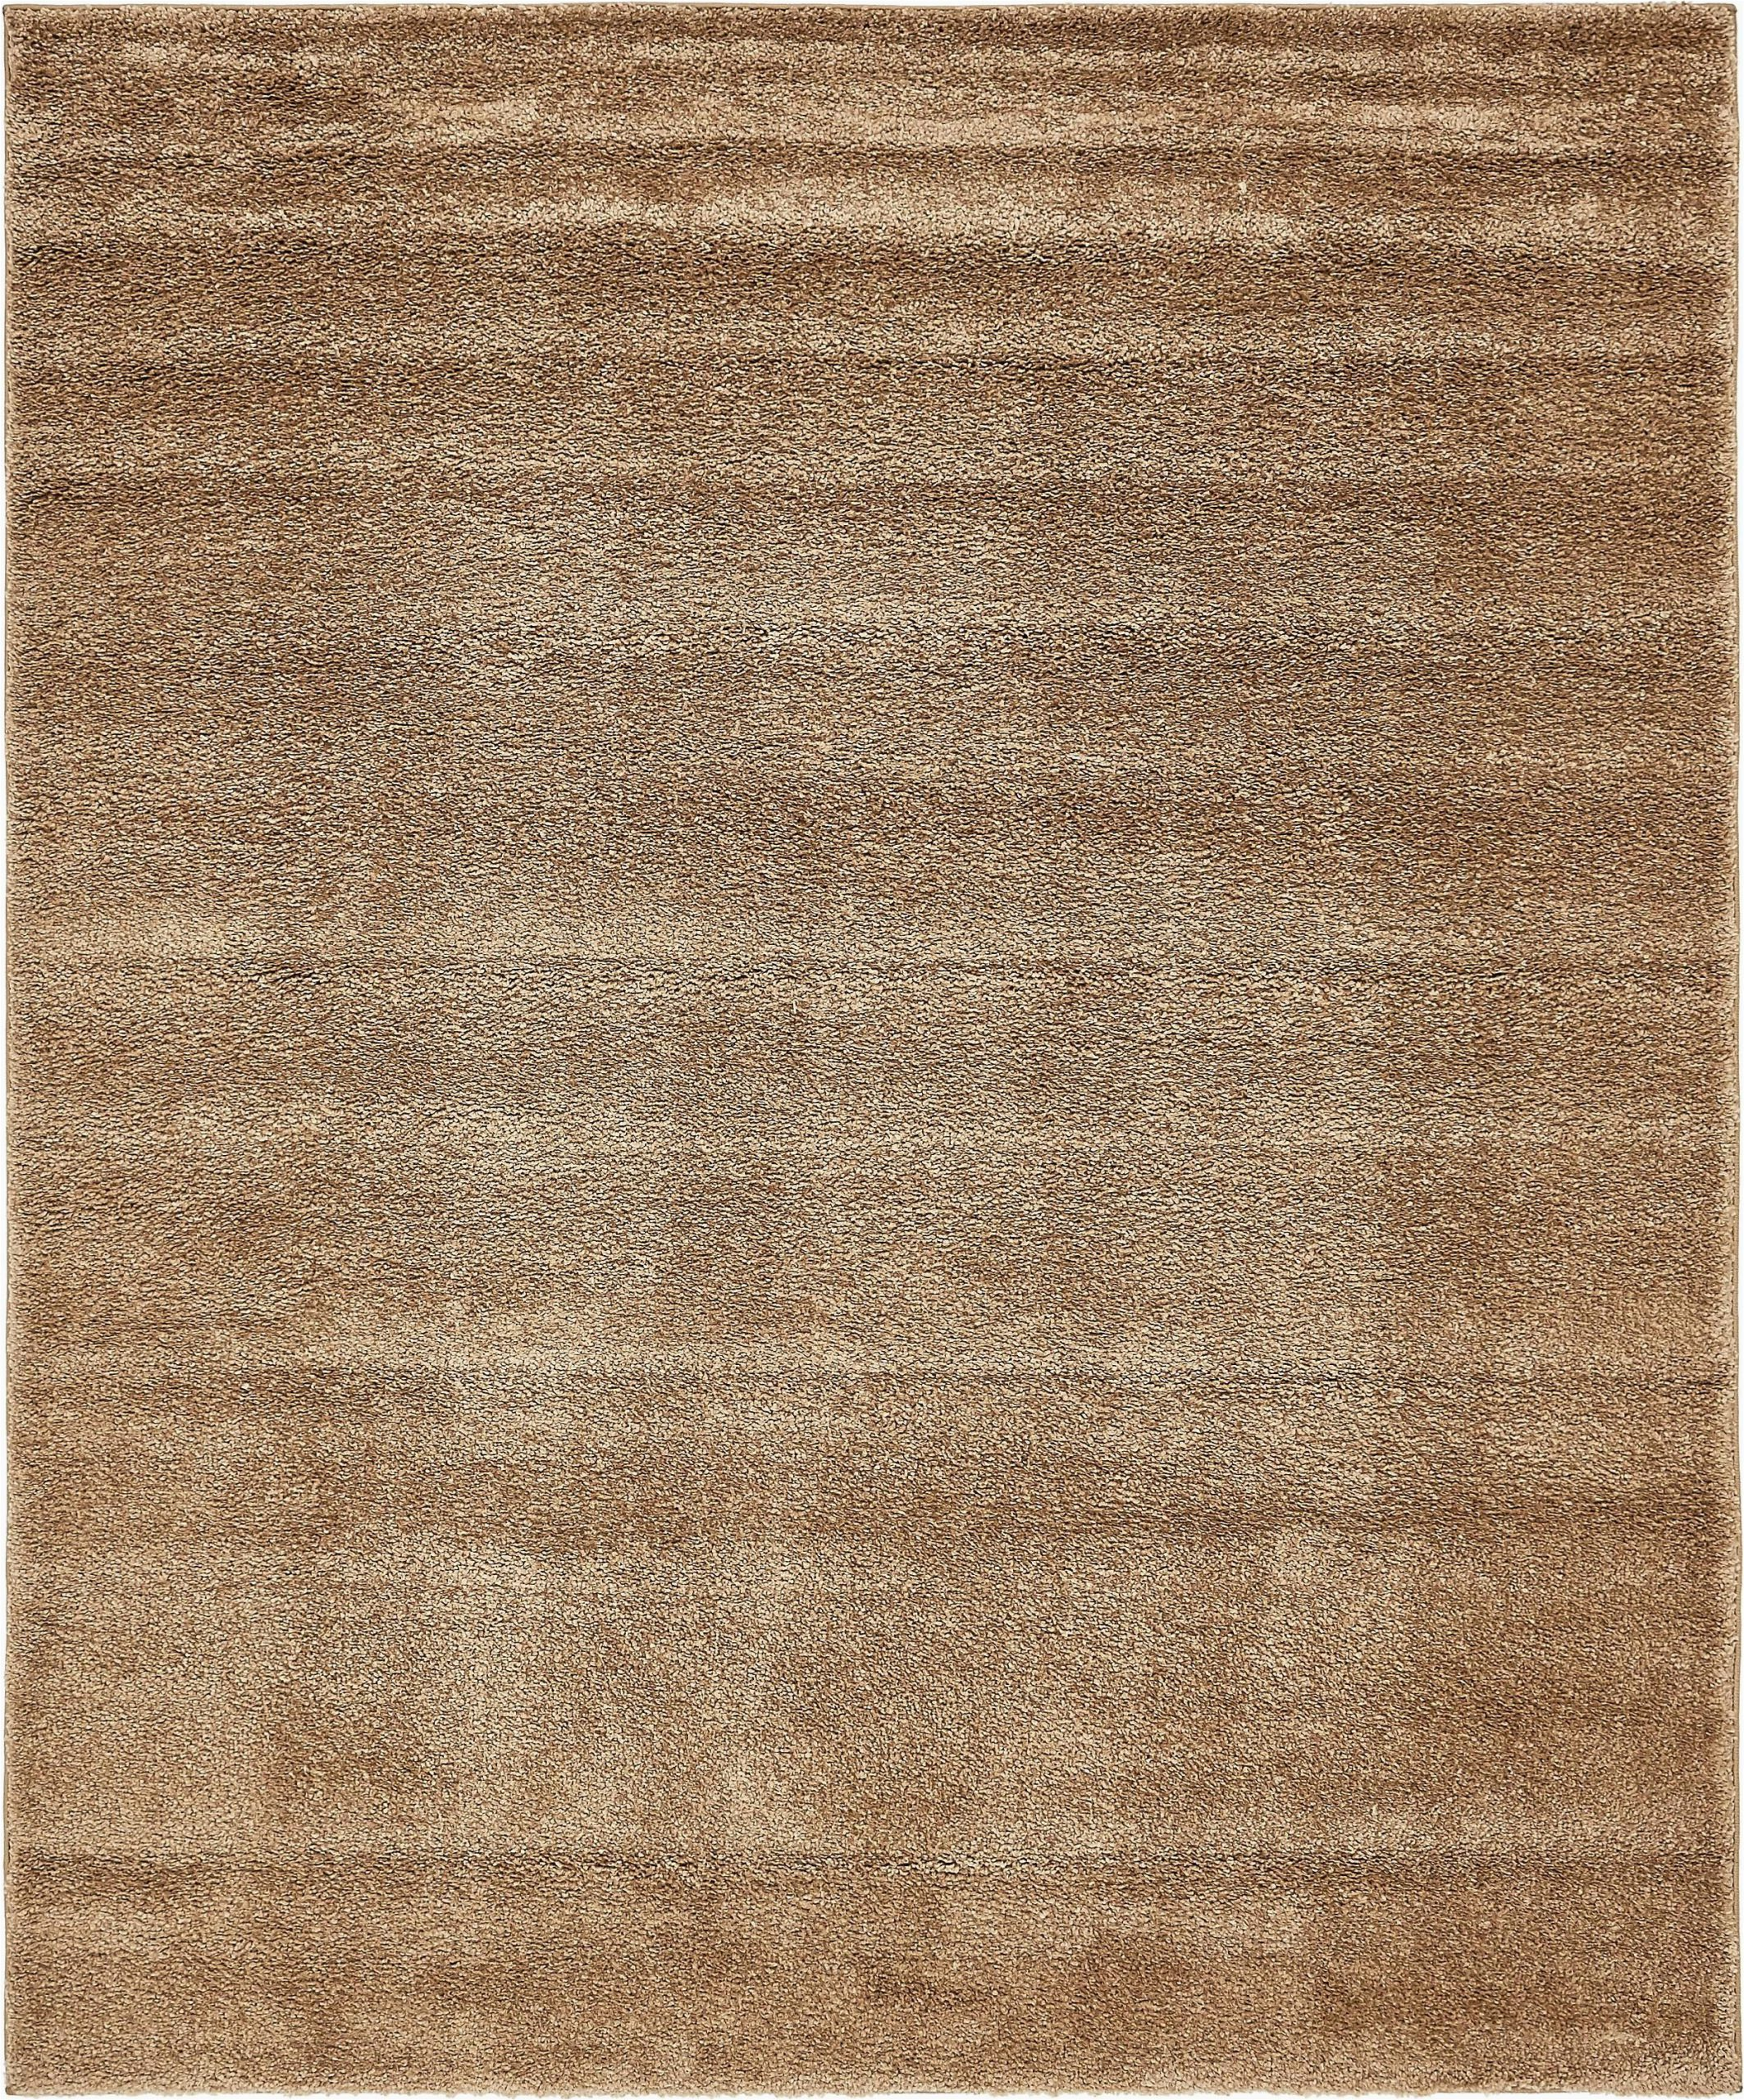 Light Brown area Rug 8×10 Light Brown 8 X 10 solid Frieze Rug Spon Brown